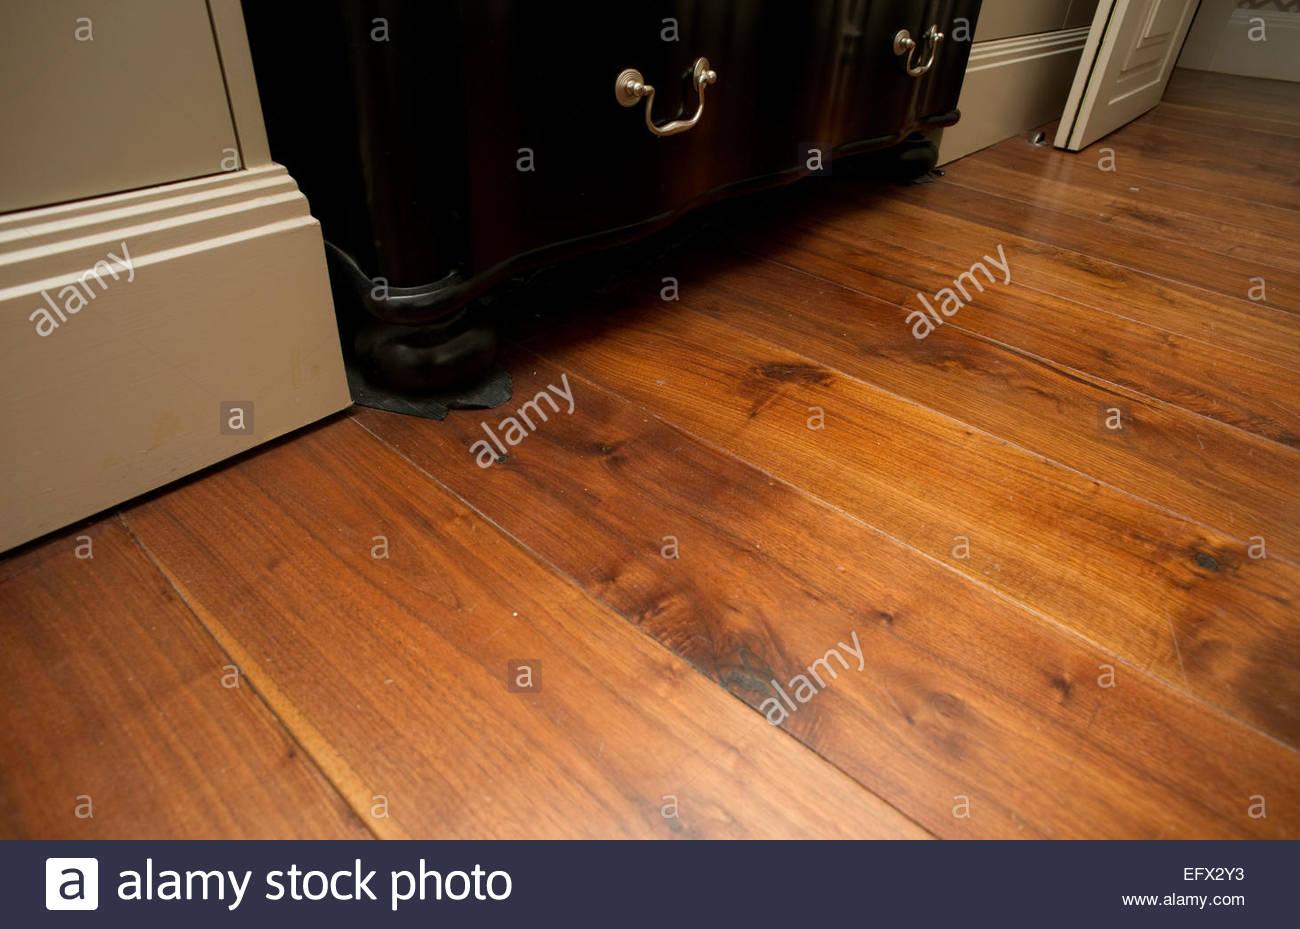 Fußboden Planken ~ Großbritannien england london hölzernen bodenbelag fußboden